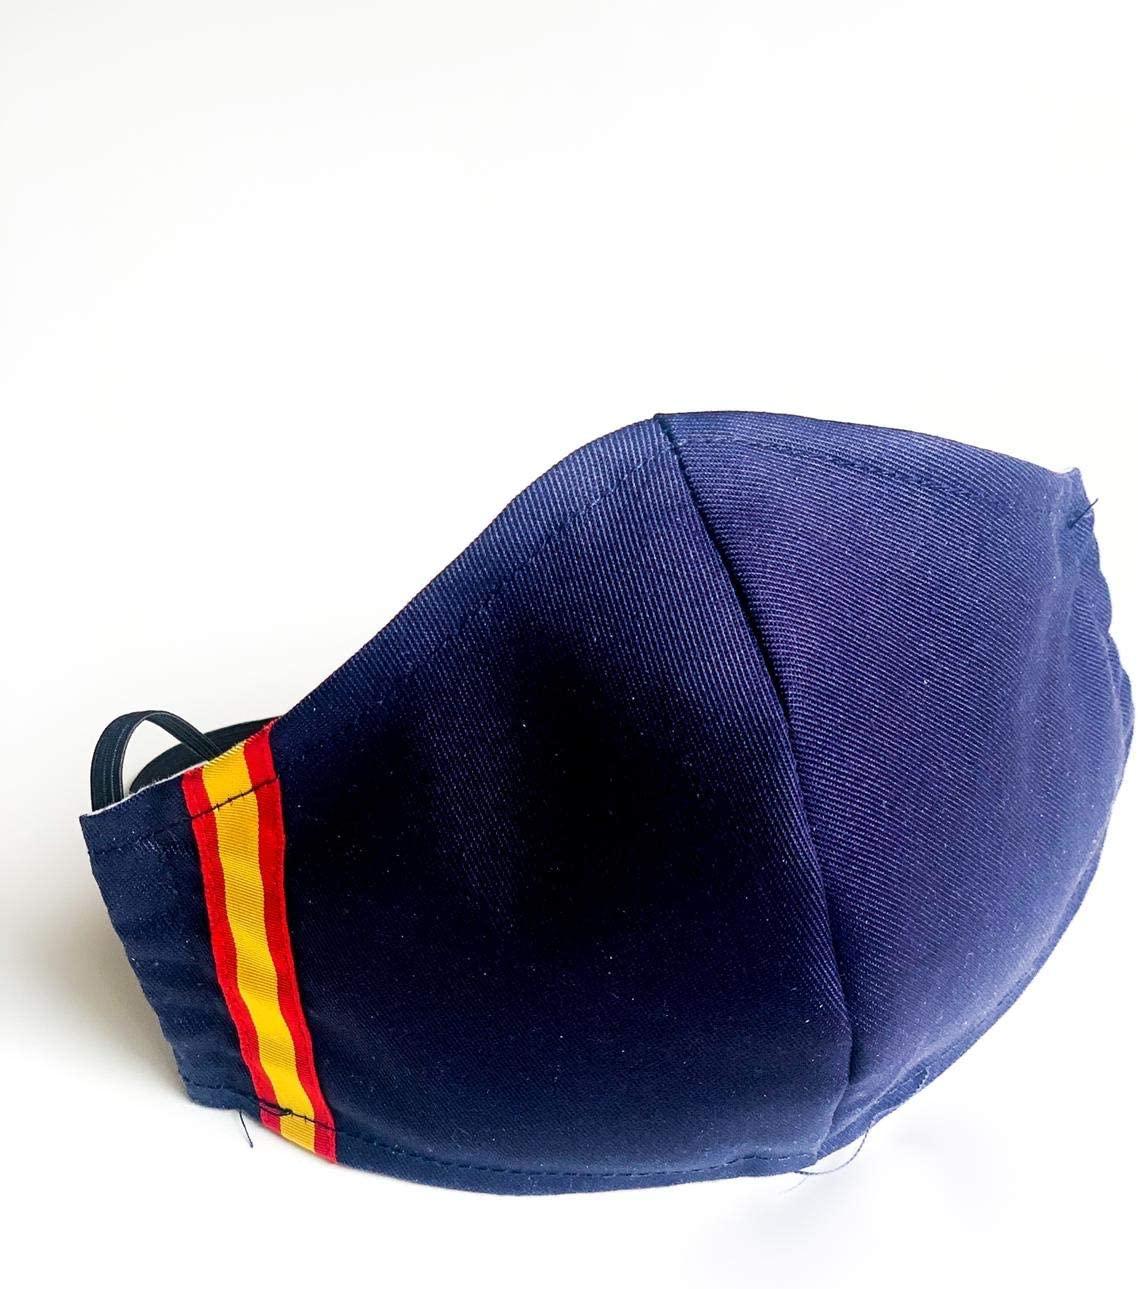 mascarilla-azul-con-diseno-de-espana.jpg